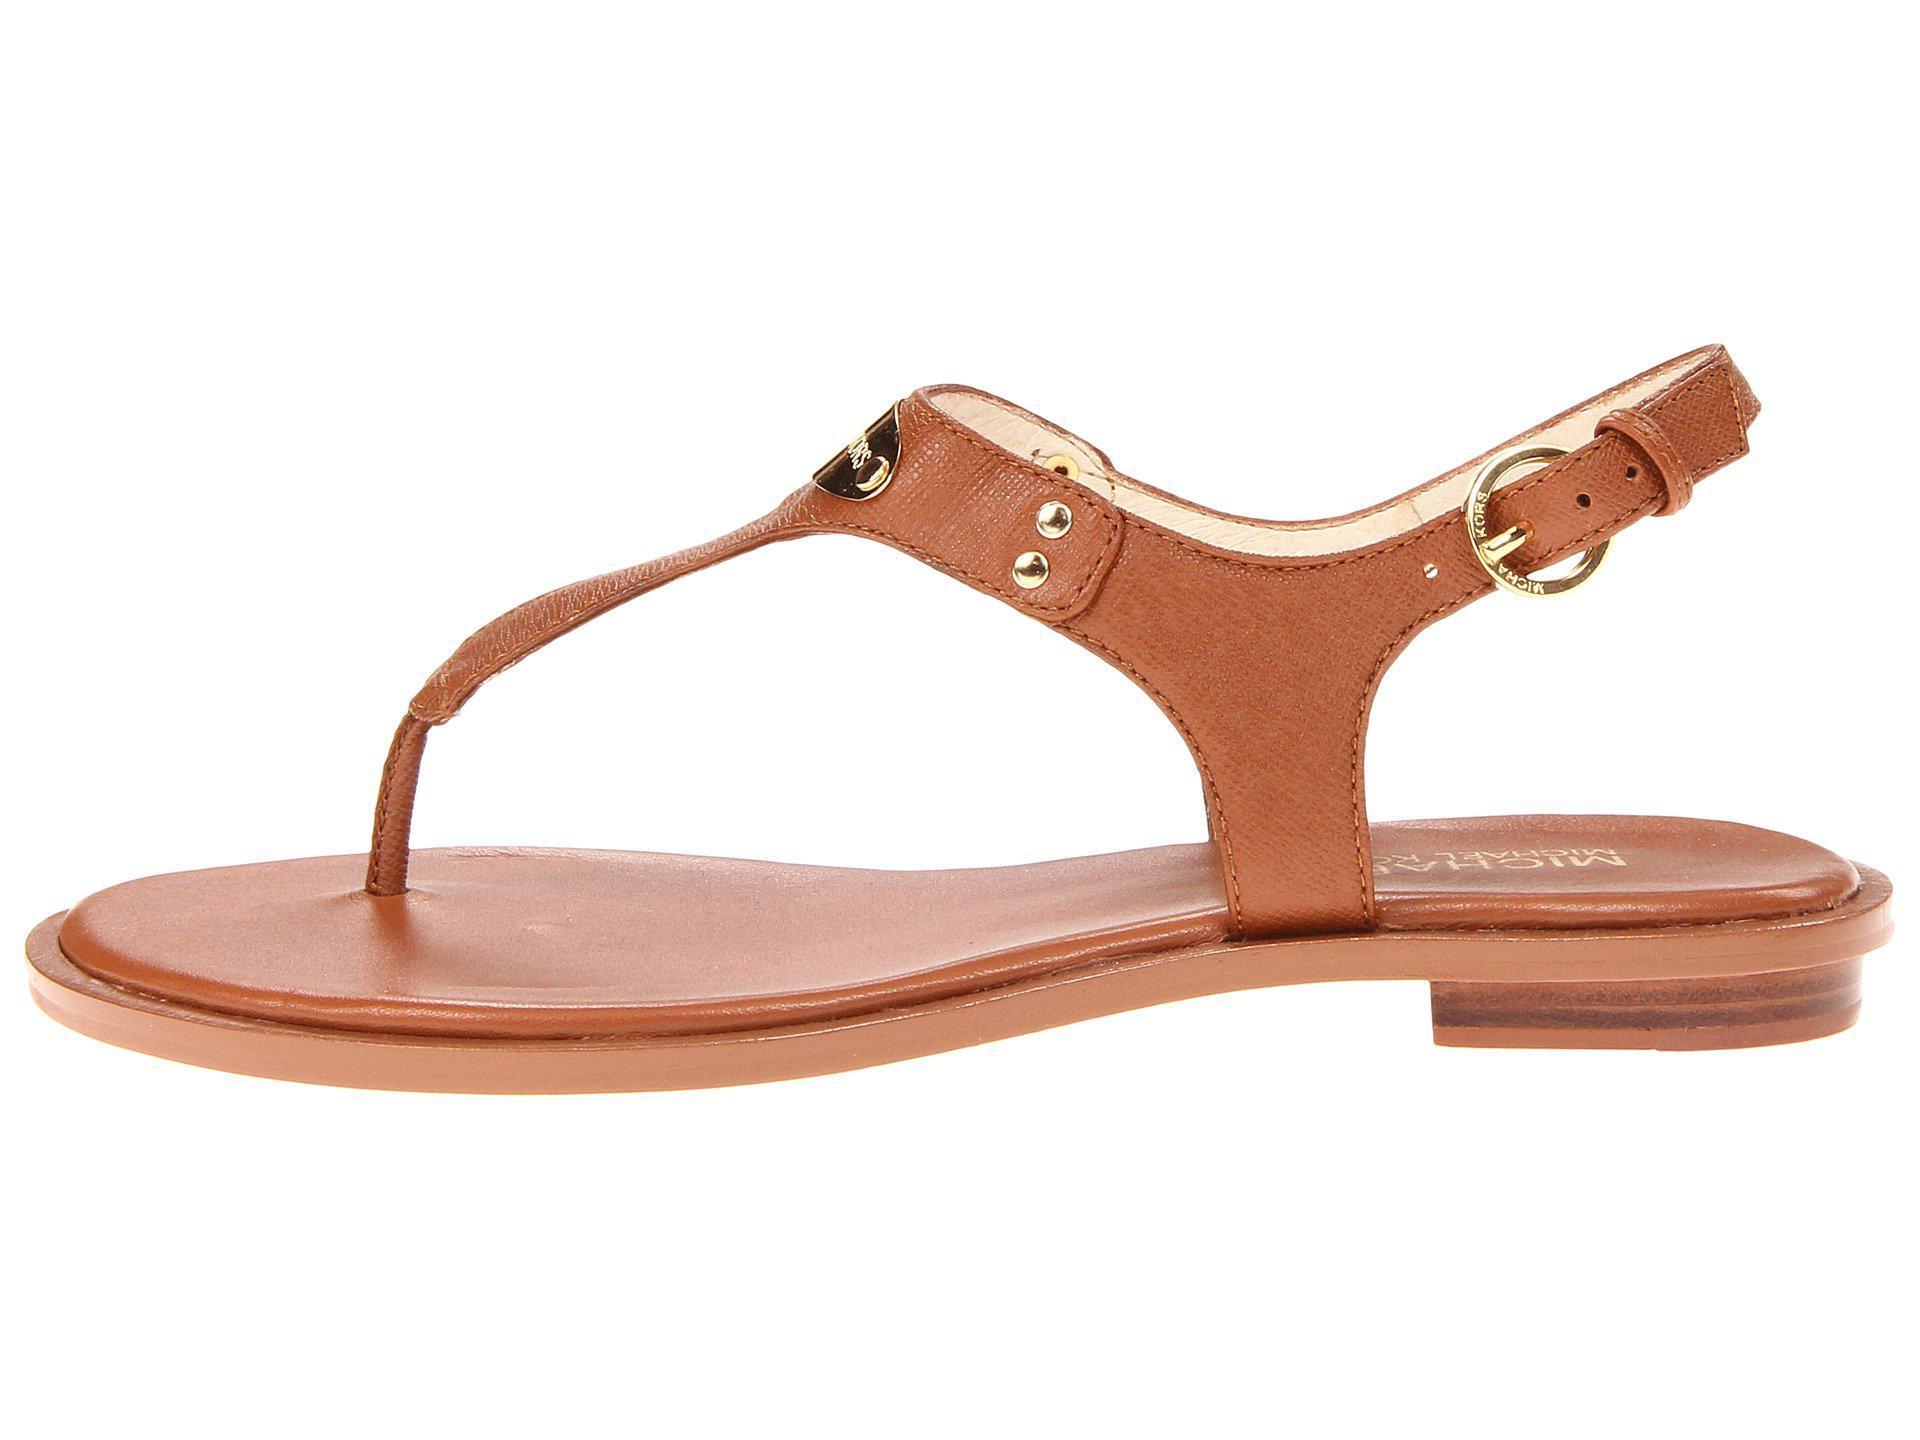 9e172e7c1f69 Lyst - MICHAEL Michael Kors Mk Plate Thong (navy Saffiano 1) Women s Sandals  in Brown - Save 38%